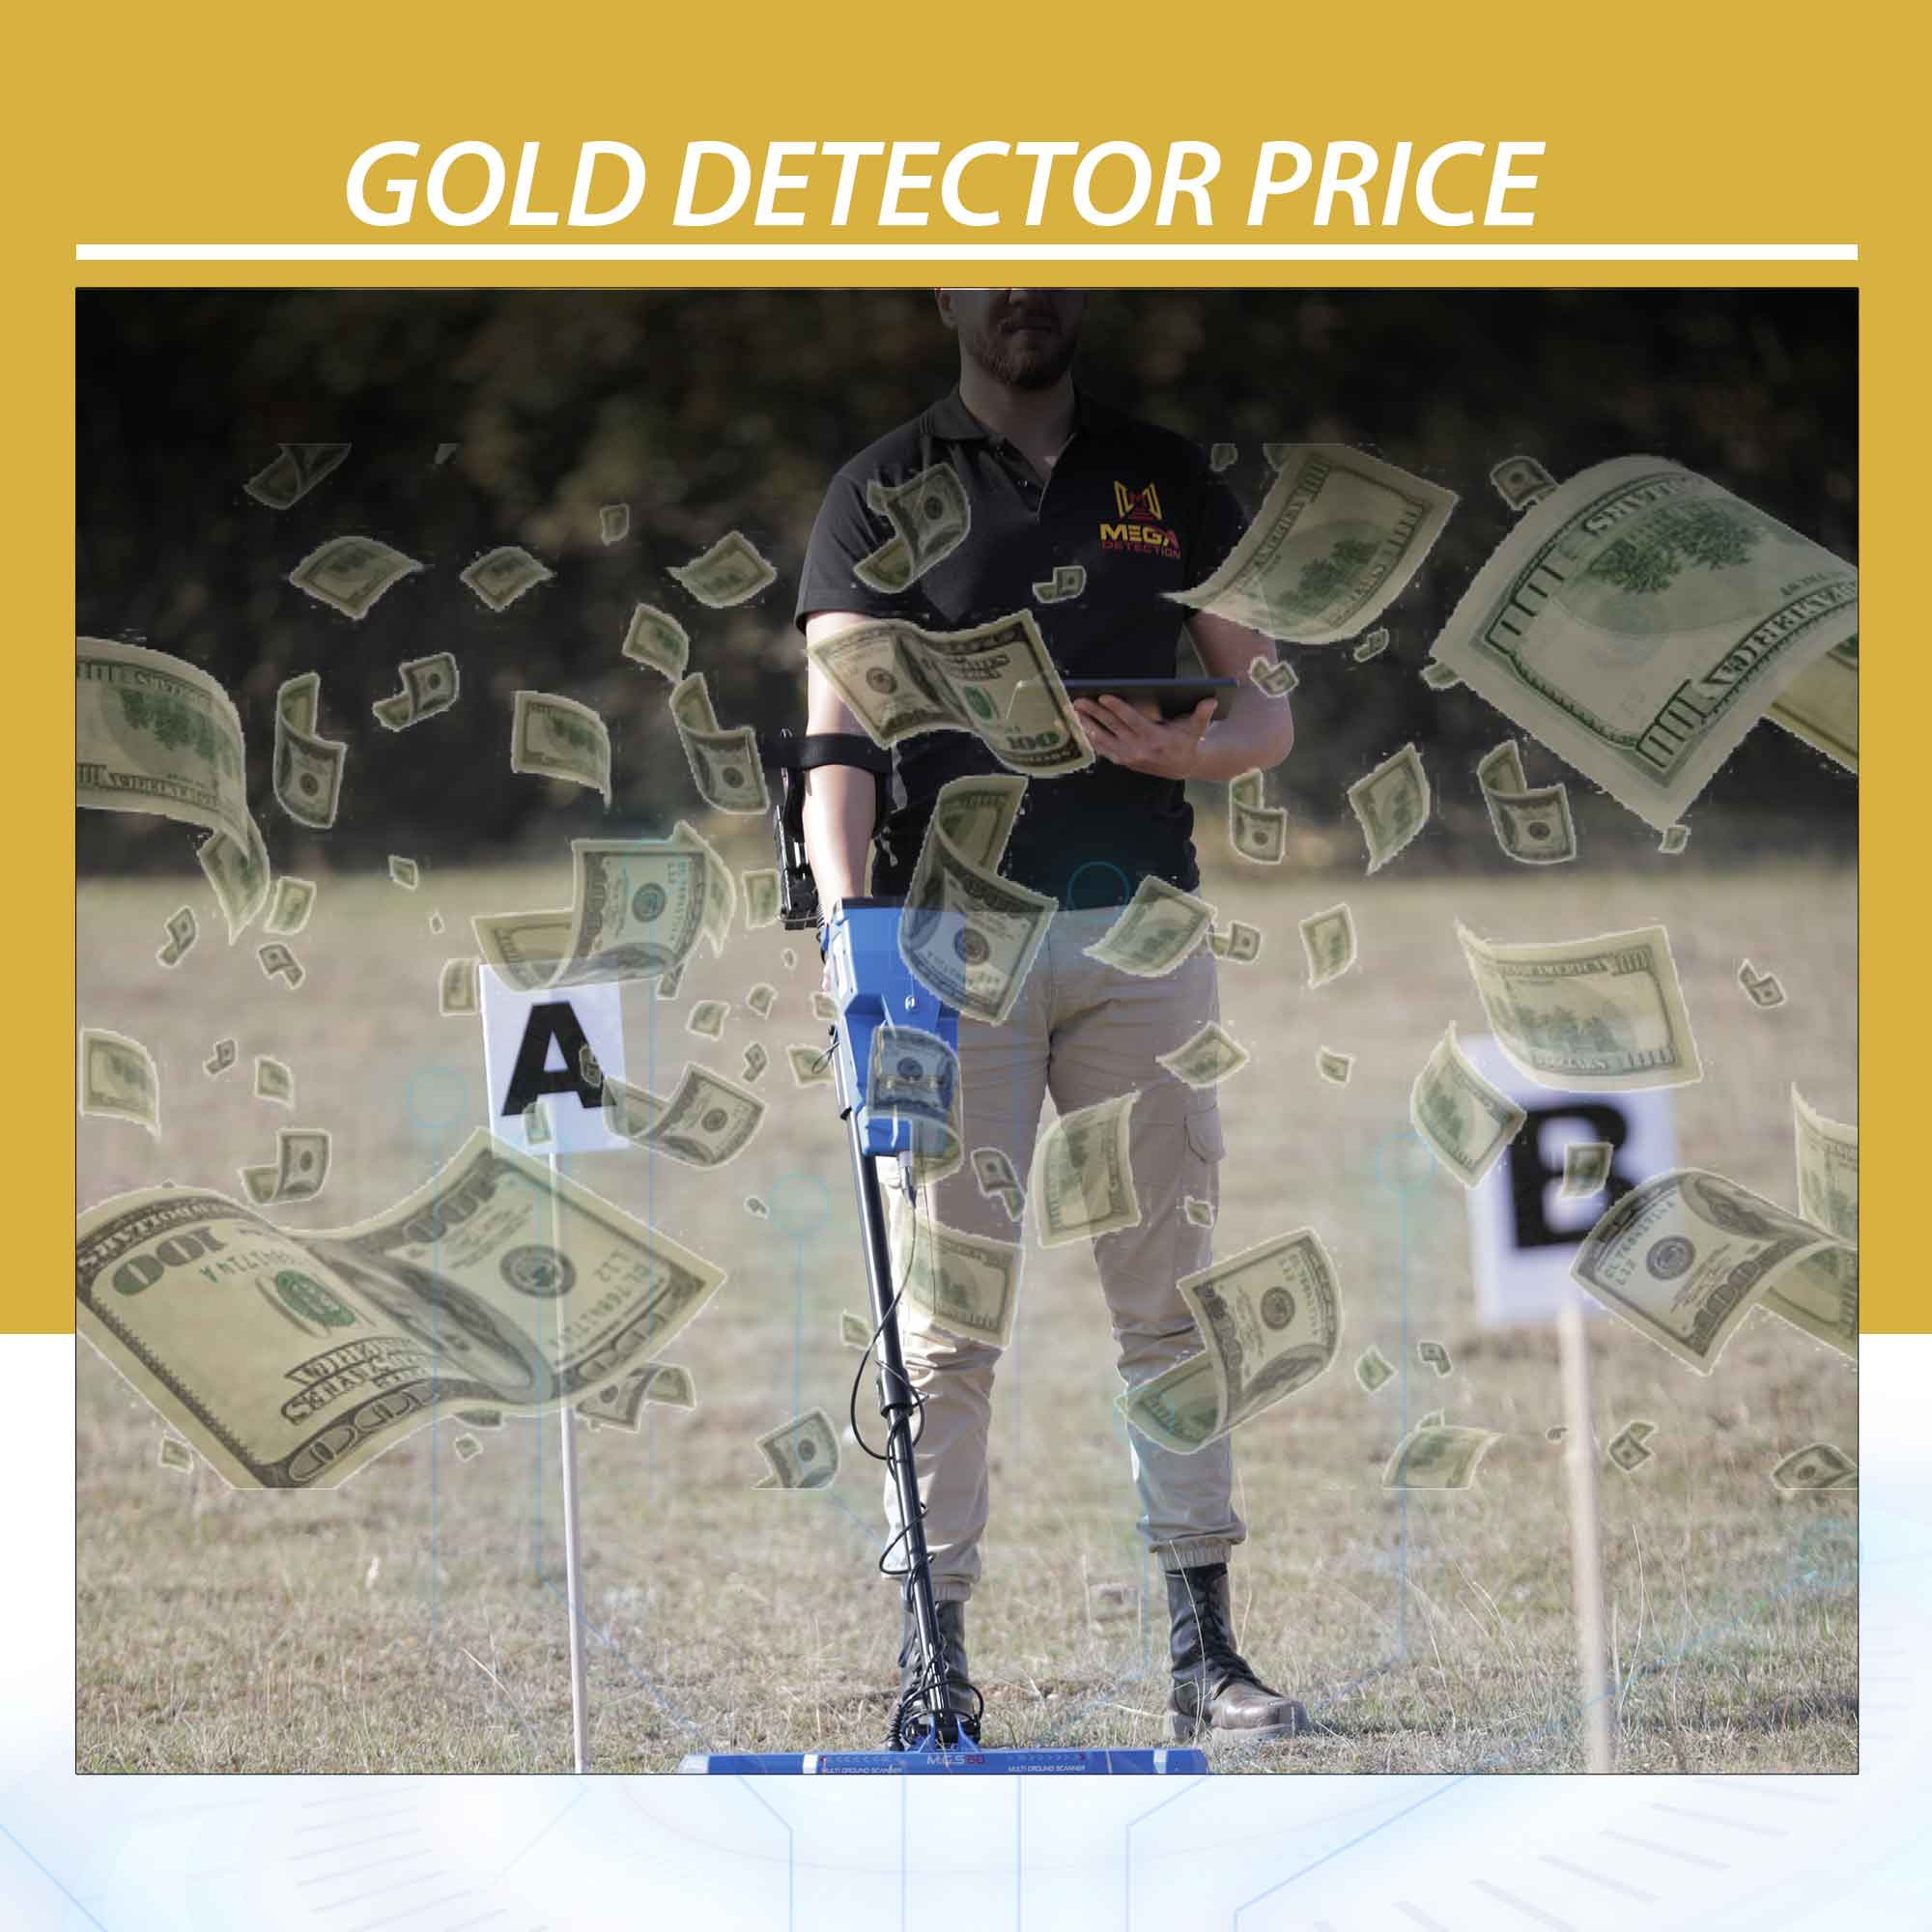 Gold Detector Price